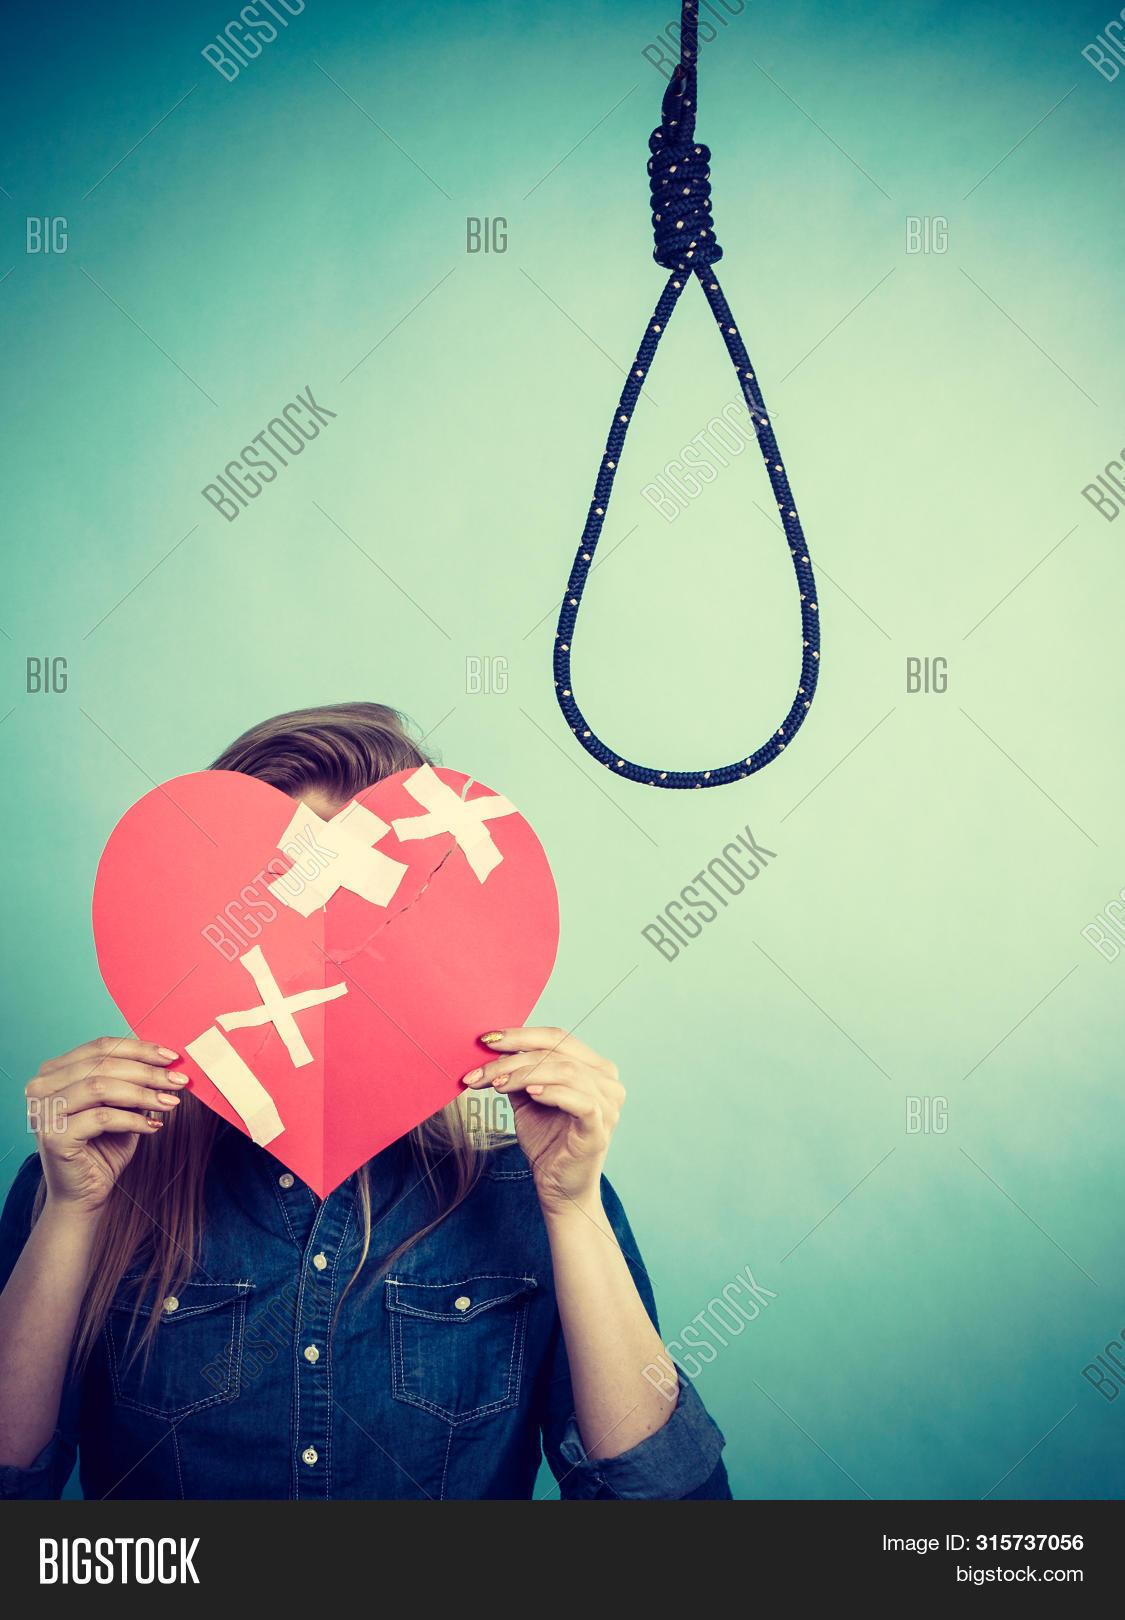 Sad Depressed Woman Image Photo Free Trial Bigstock